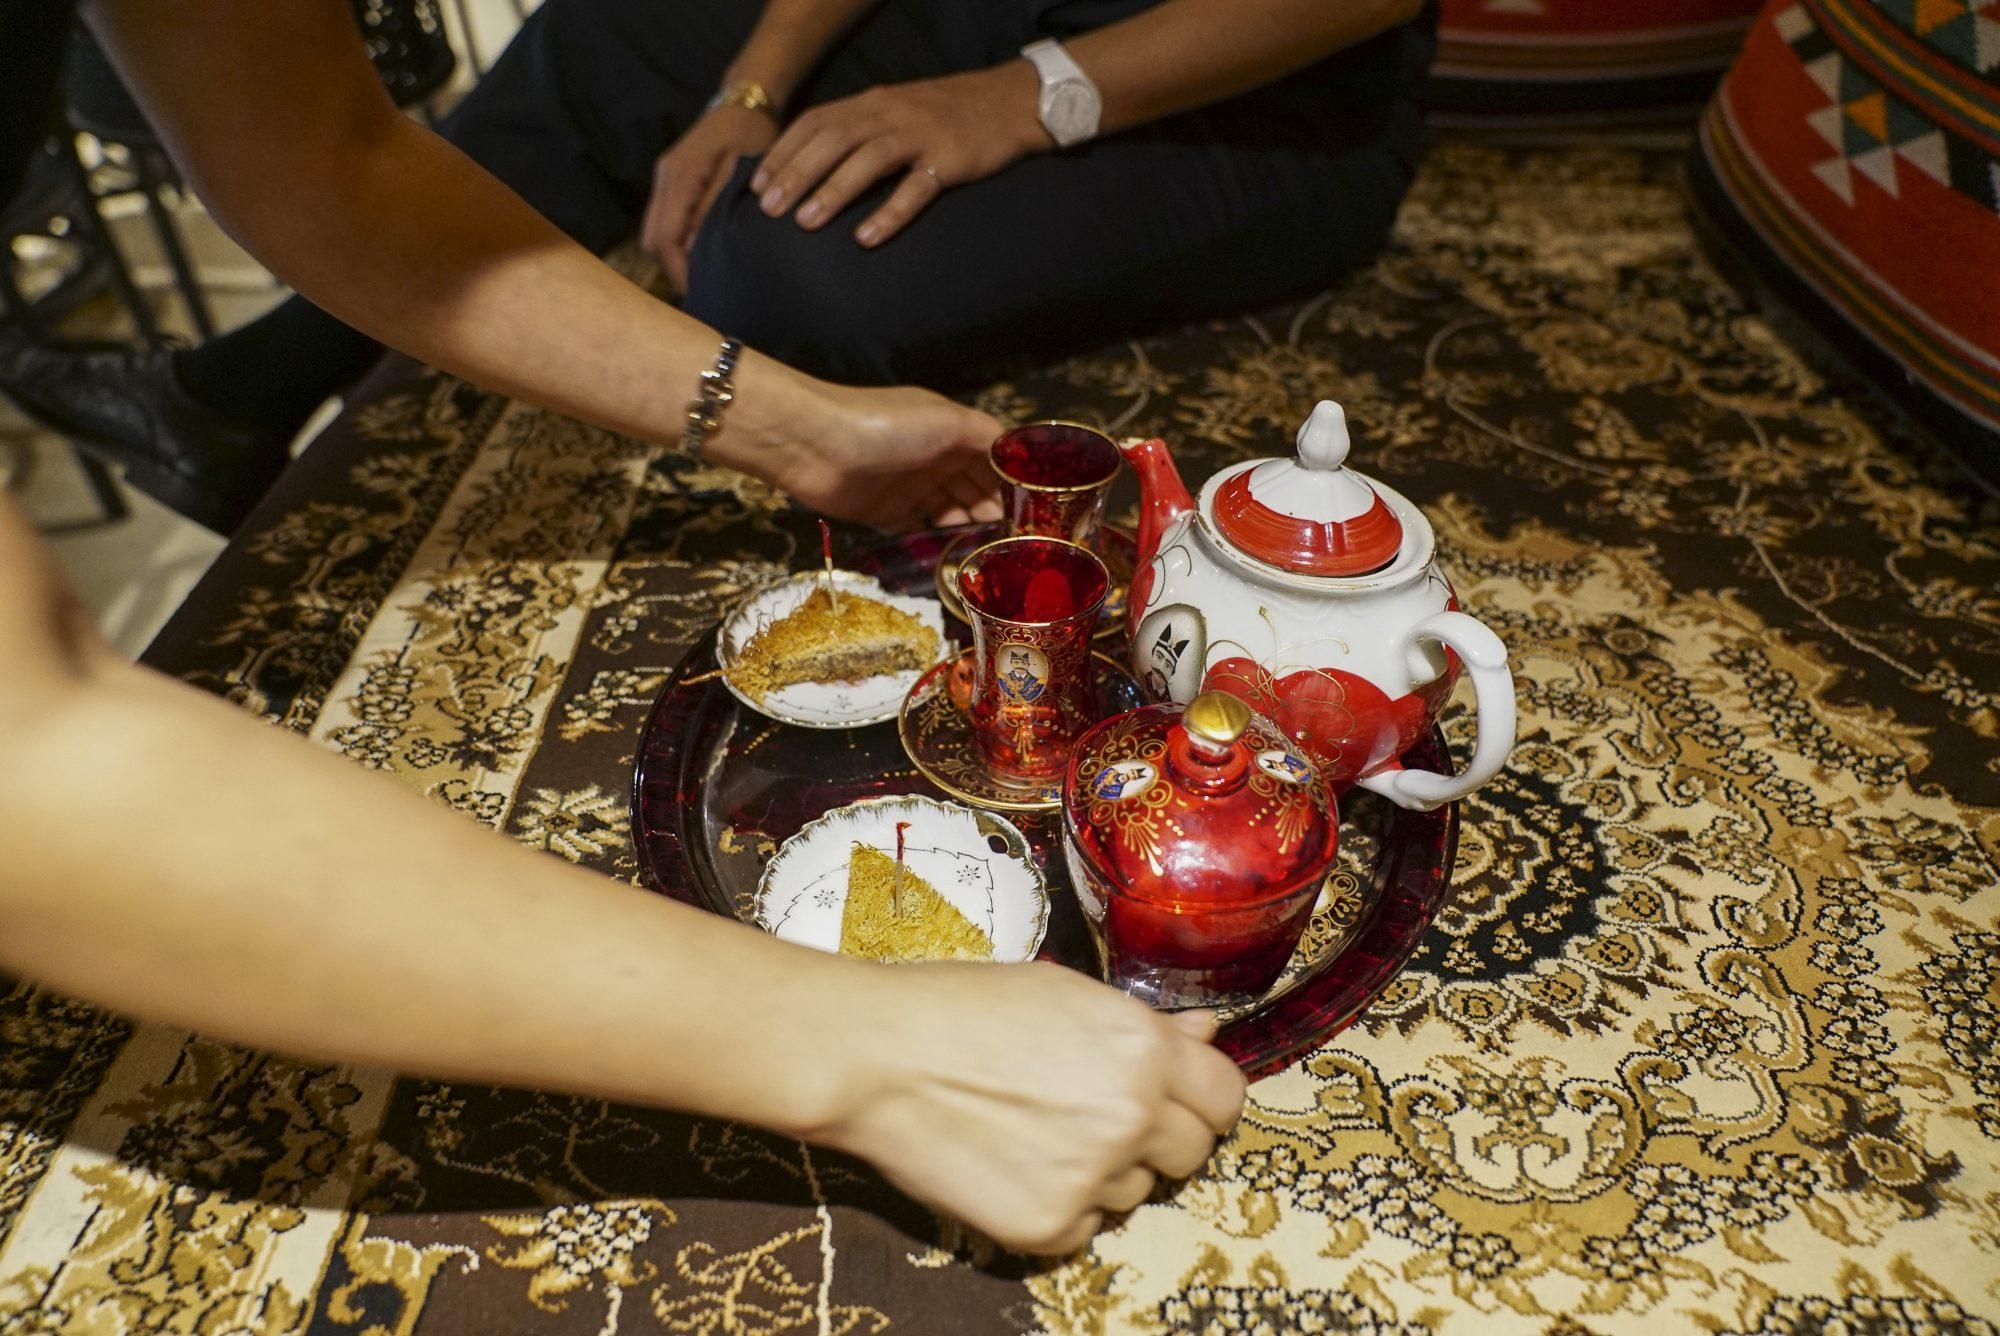 toronto-restaurants-chefs-in-the-burbs-samira-mohyeddin-banu-north-york-shabestan-tea-setting